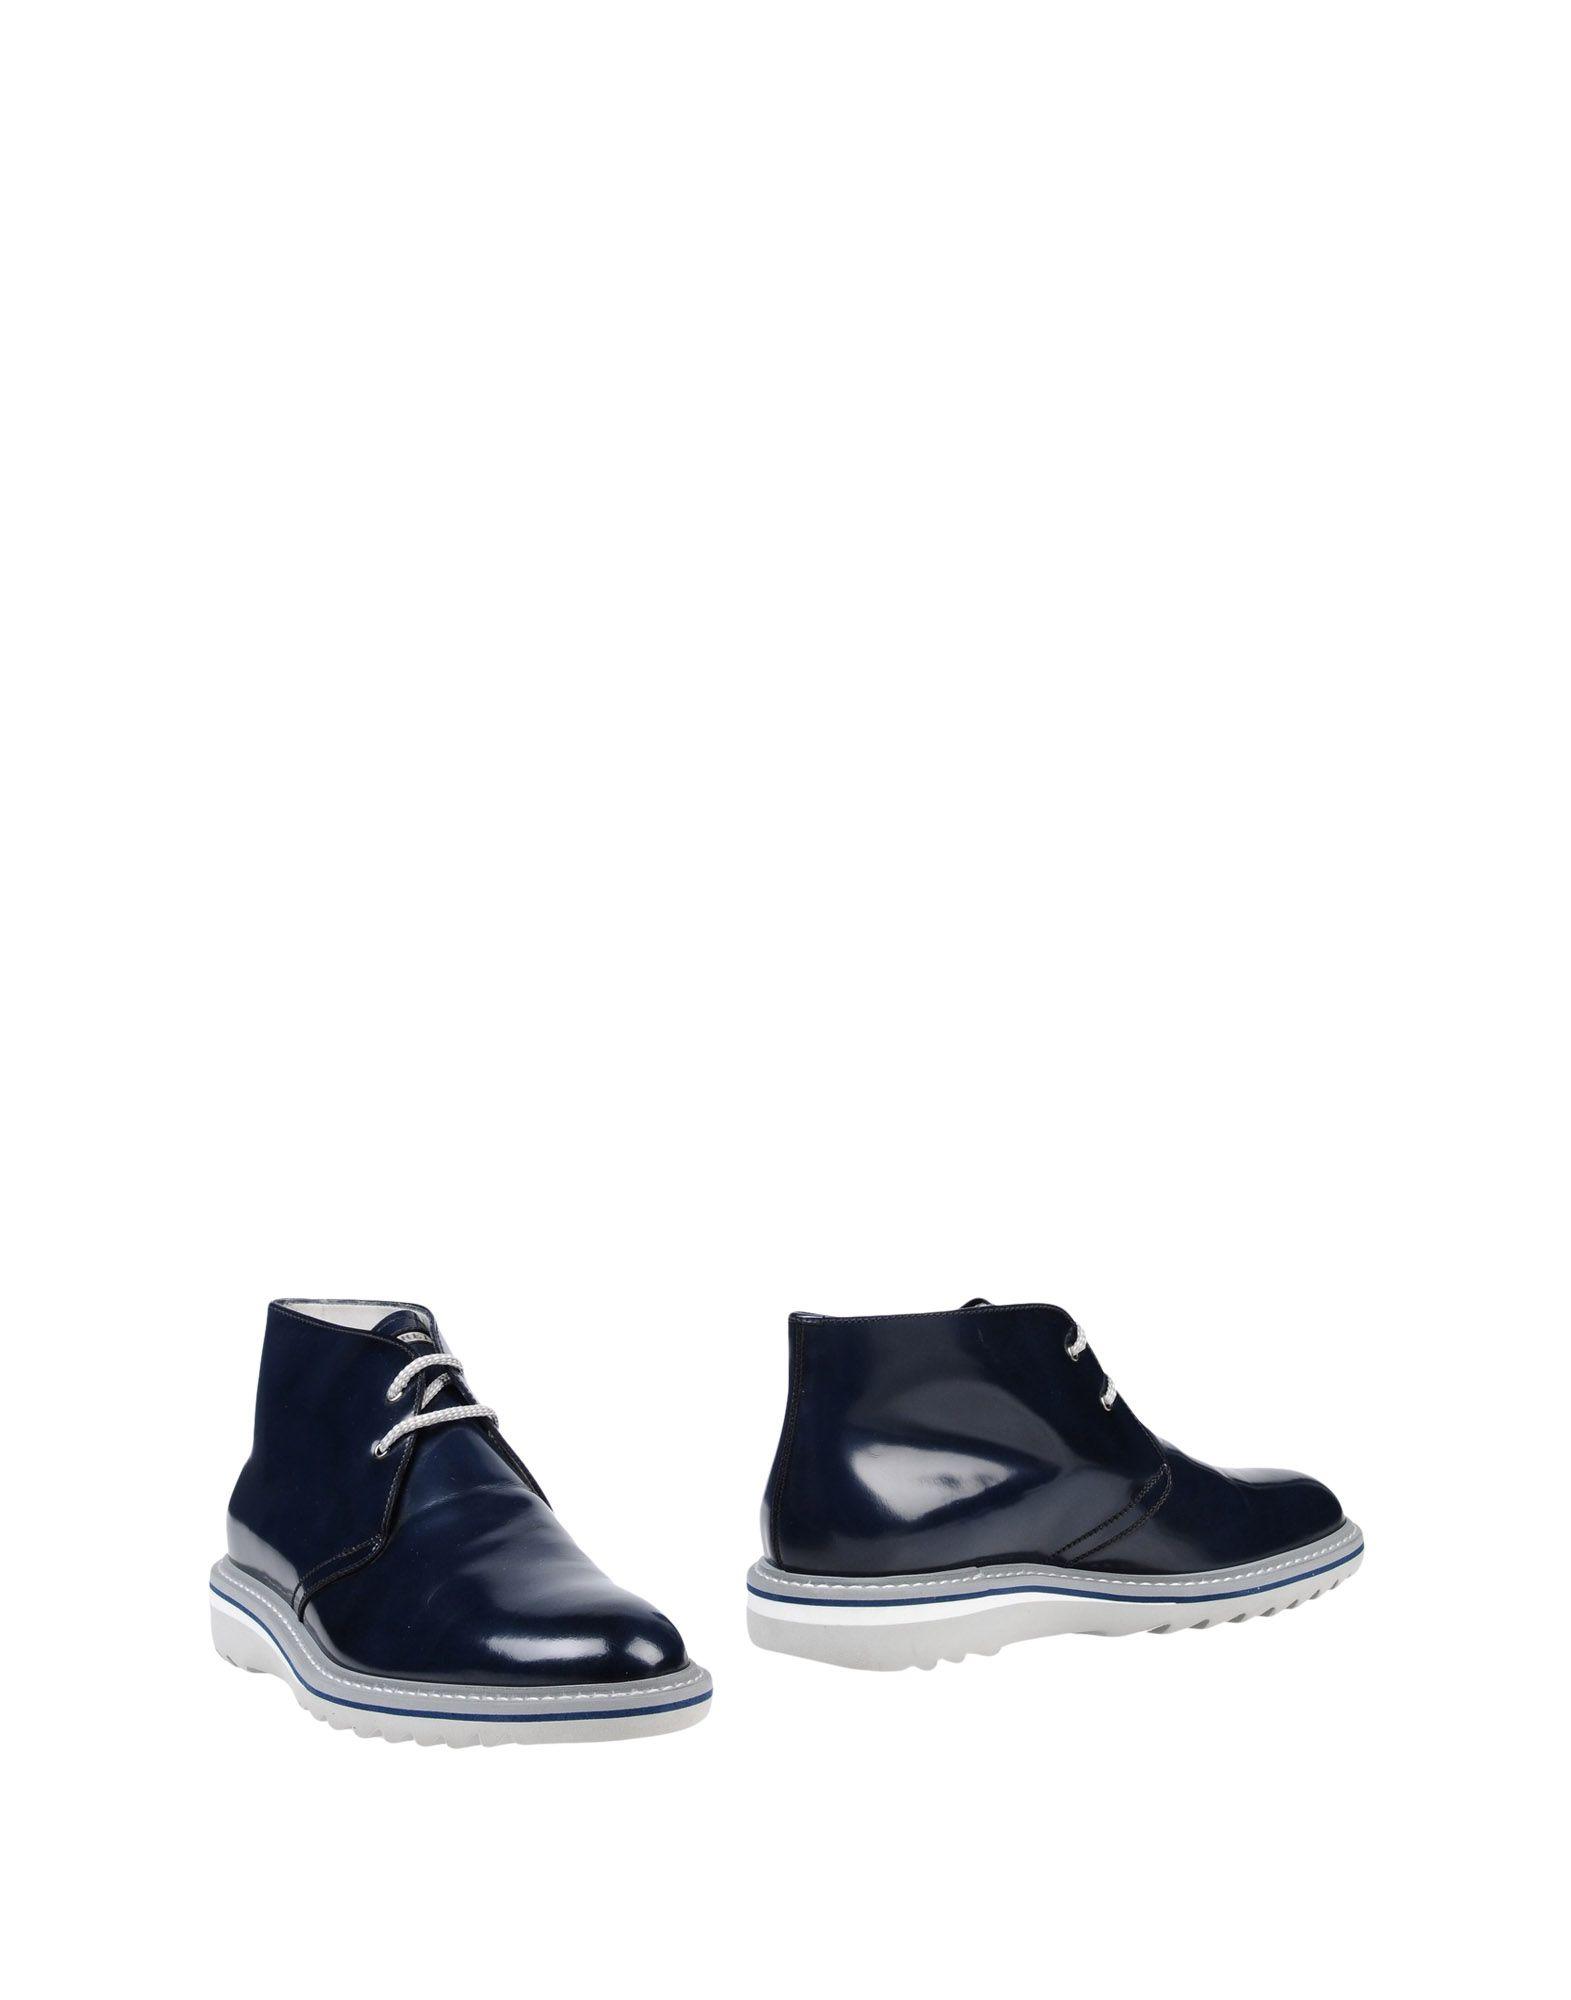 BLU|BARRETT by BARRETT Полусапоги и высокие ботинки футболка мужская neil barrett fa01 2015